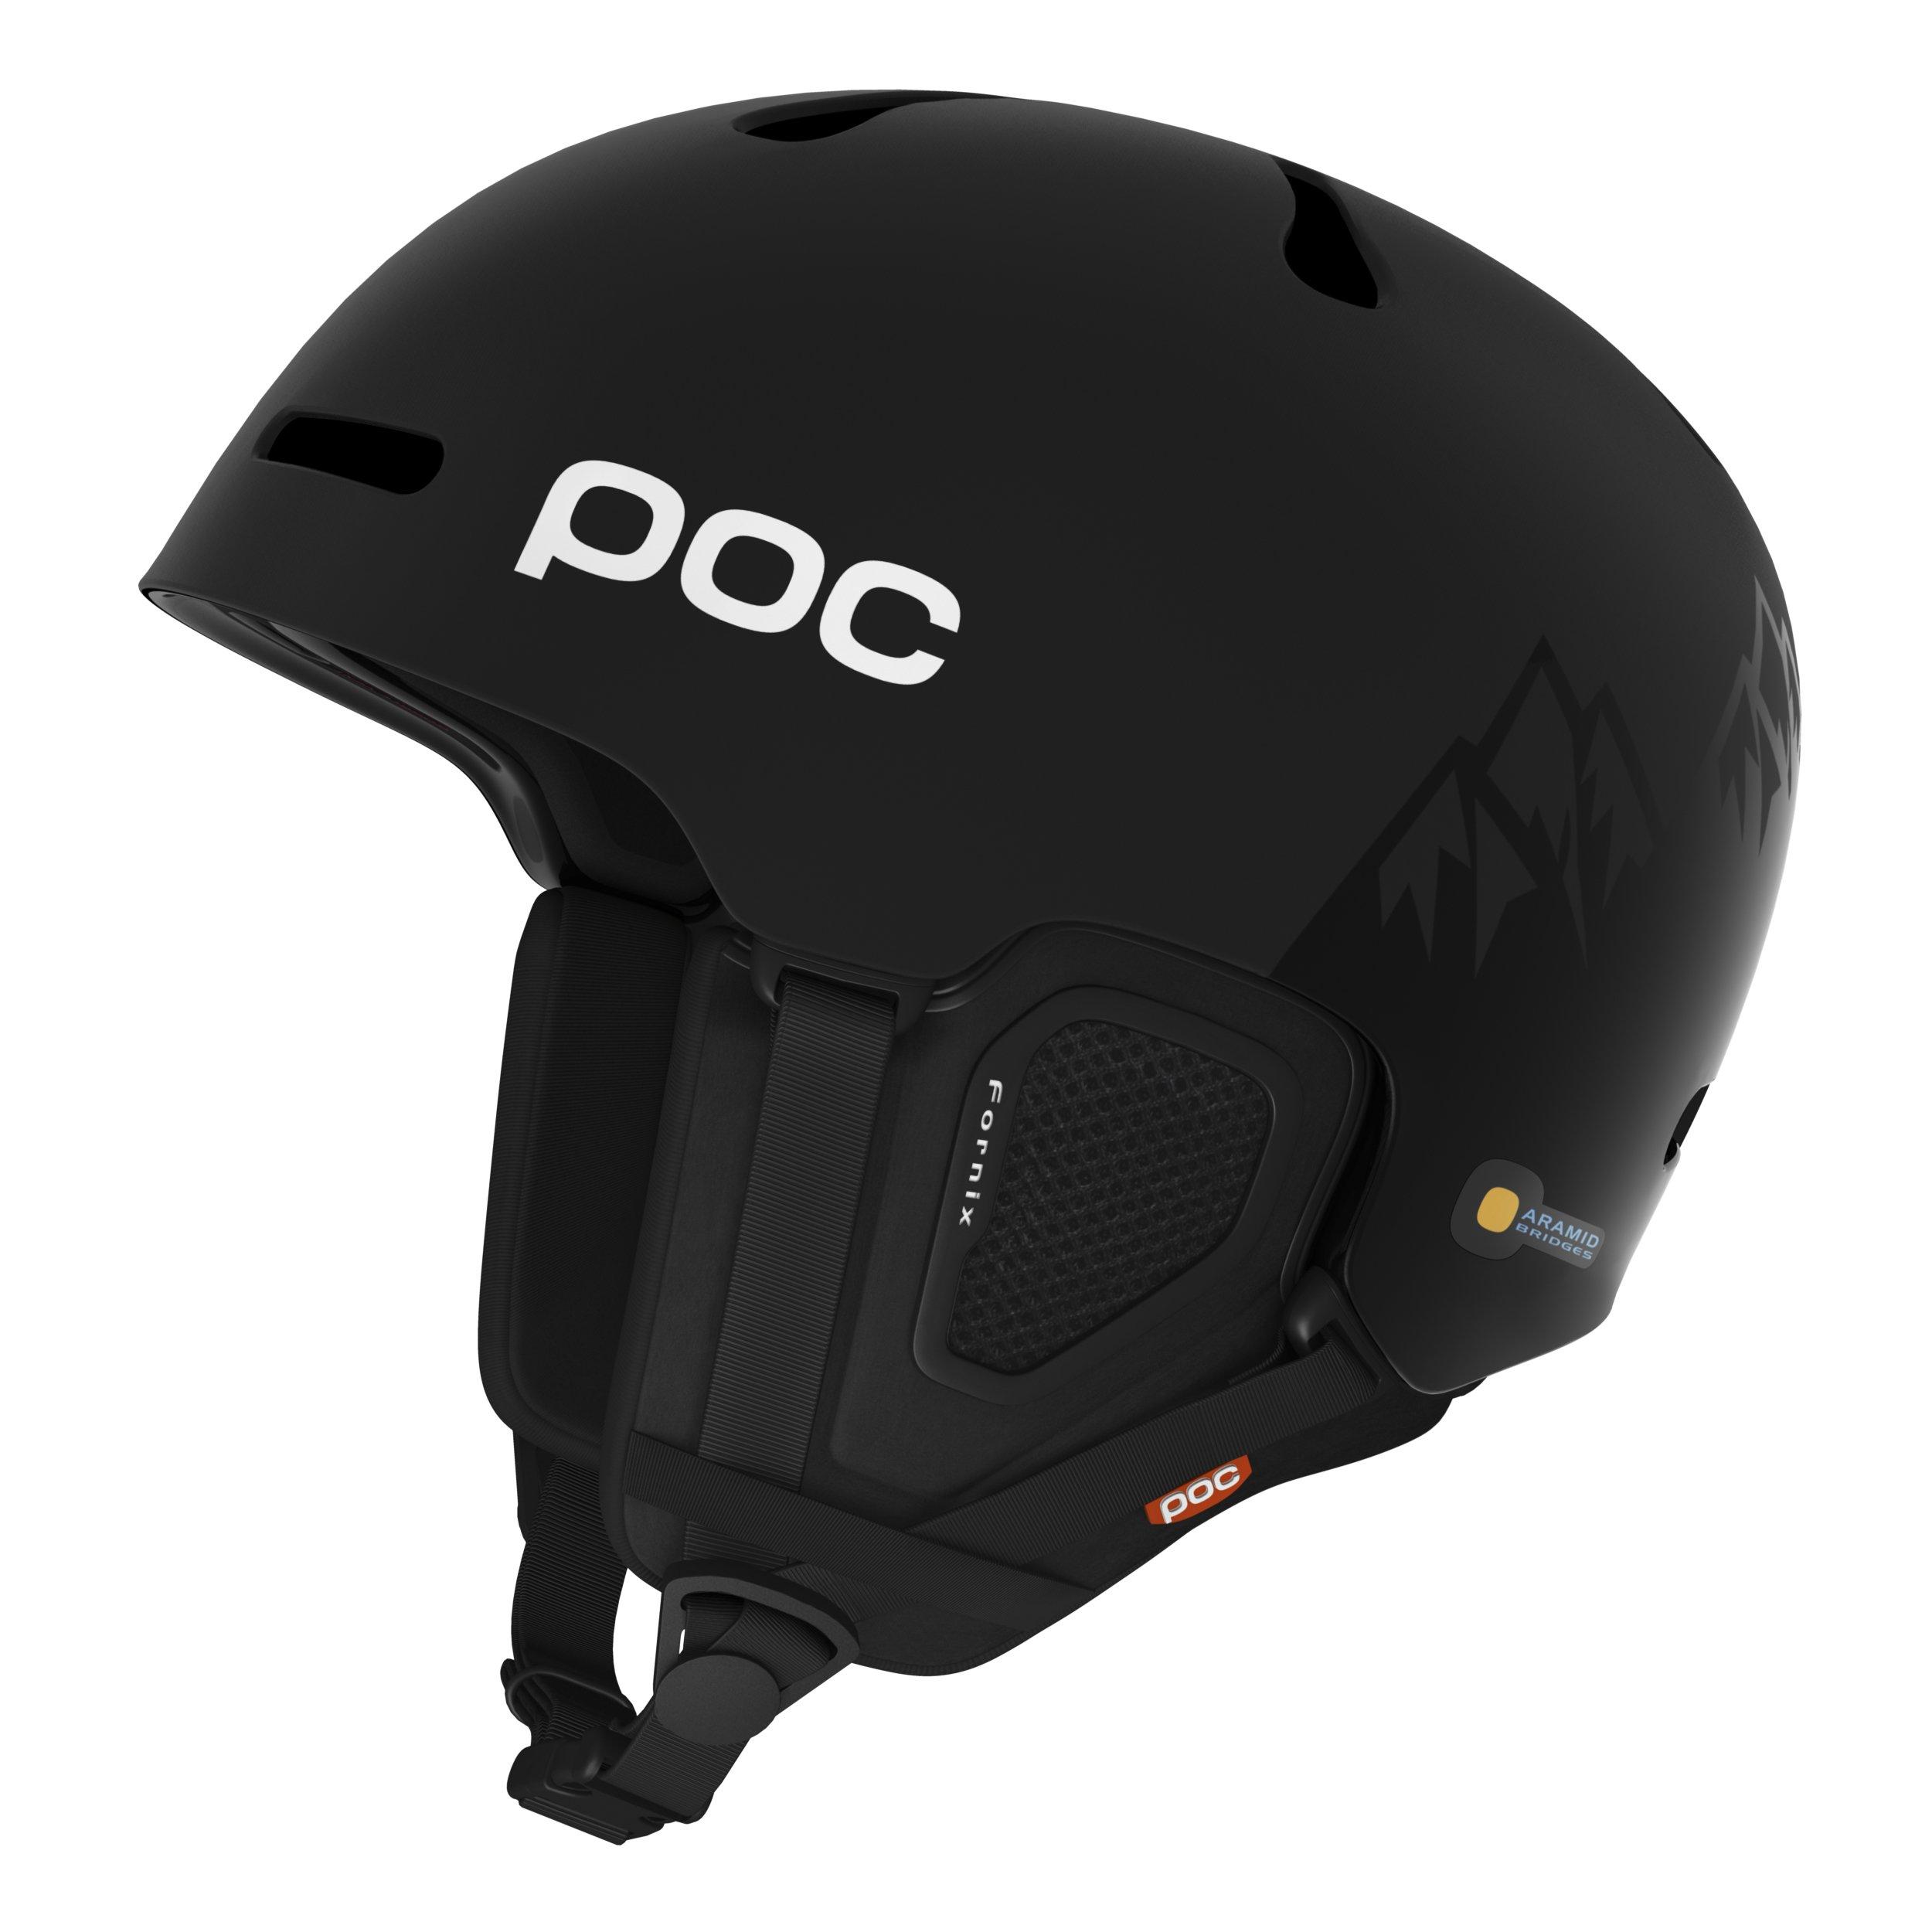 POC Fornix Backcountry MIPS Ski Helmet, Uranium Black, Medium/Large by POC